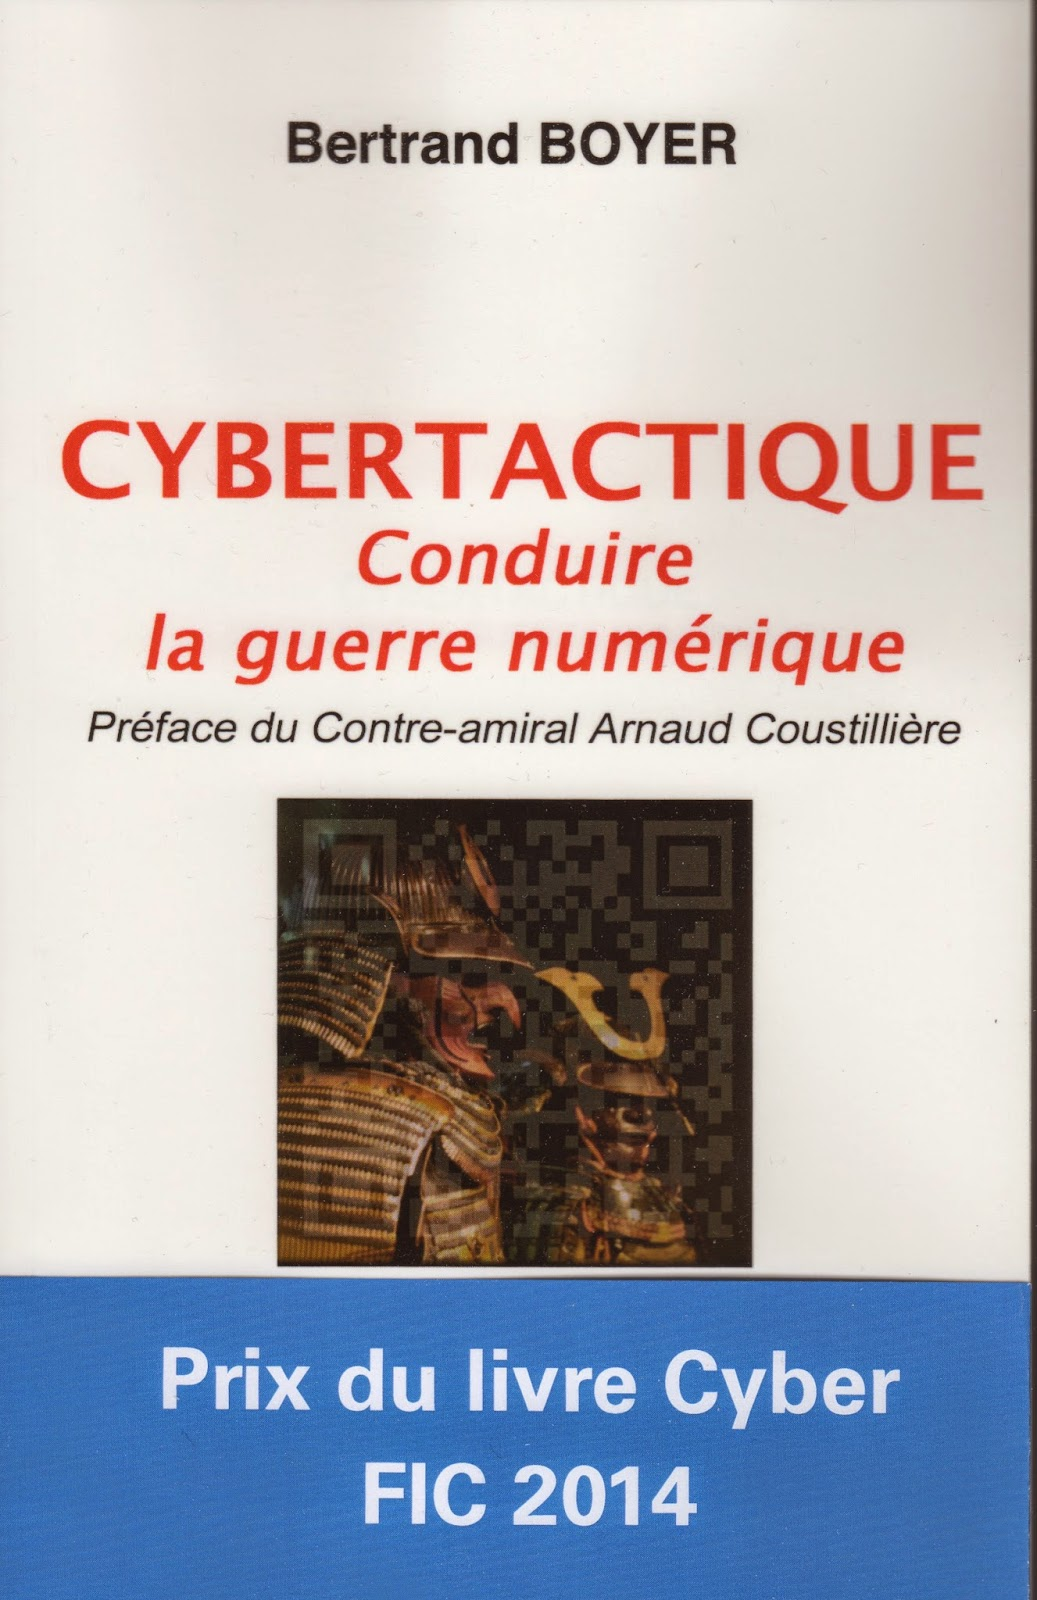 http://www.amazon.fr/Cybertactique-Conduire-Guerre-Numerique-Bertrand/dp/2363670604/ref=sr_1_1?s=books&ie=UTF8&qid=1390415899&sr=1-1&keywords=cybertactique